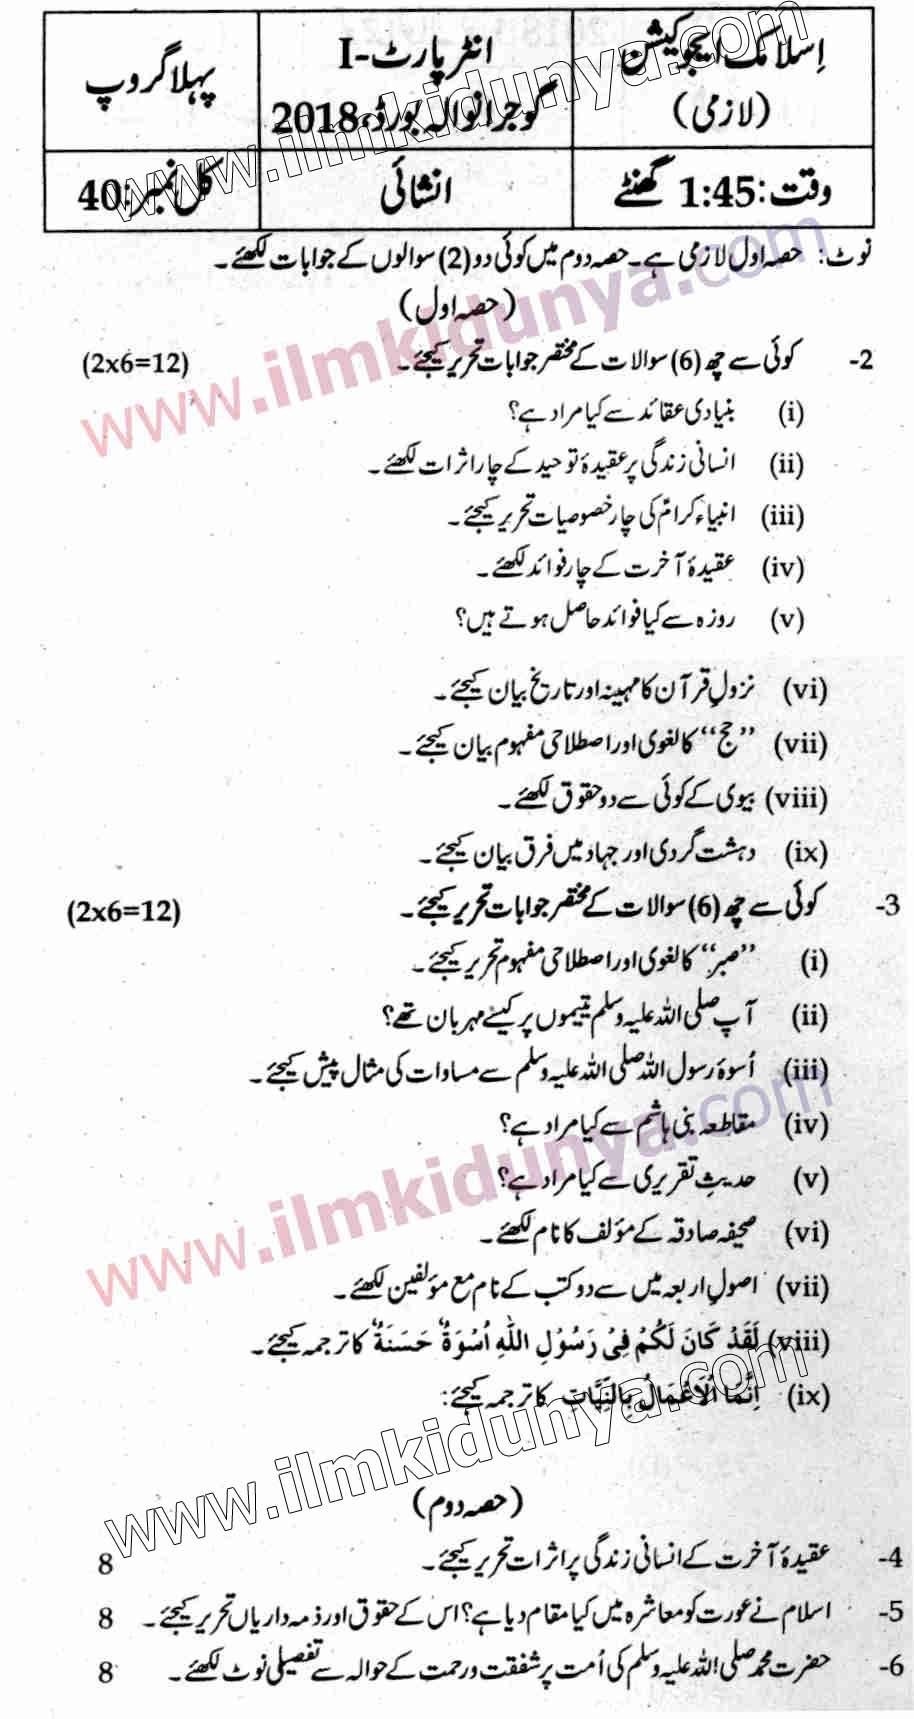 Past Papers 2018 Gujranwala Board Inter Part 1 Islamiat Urdu